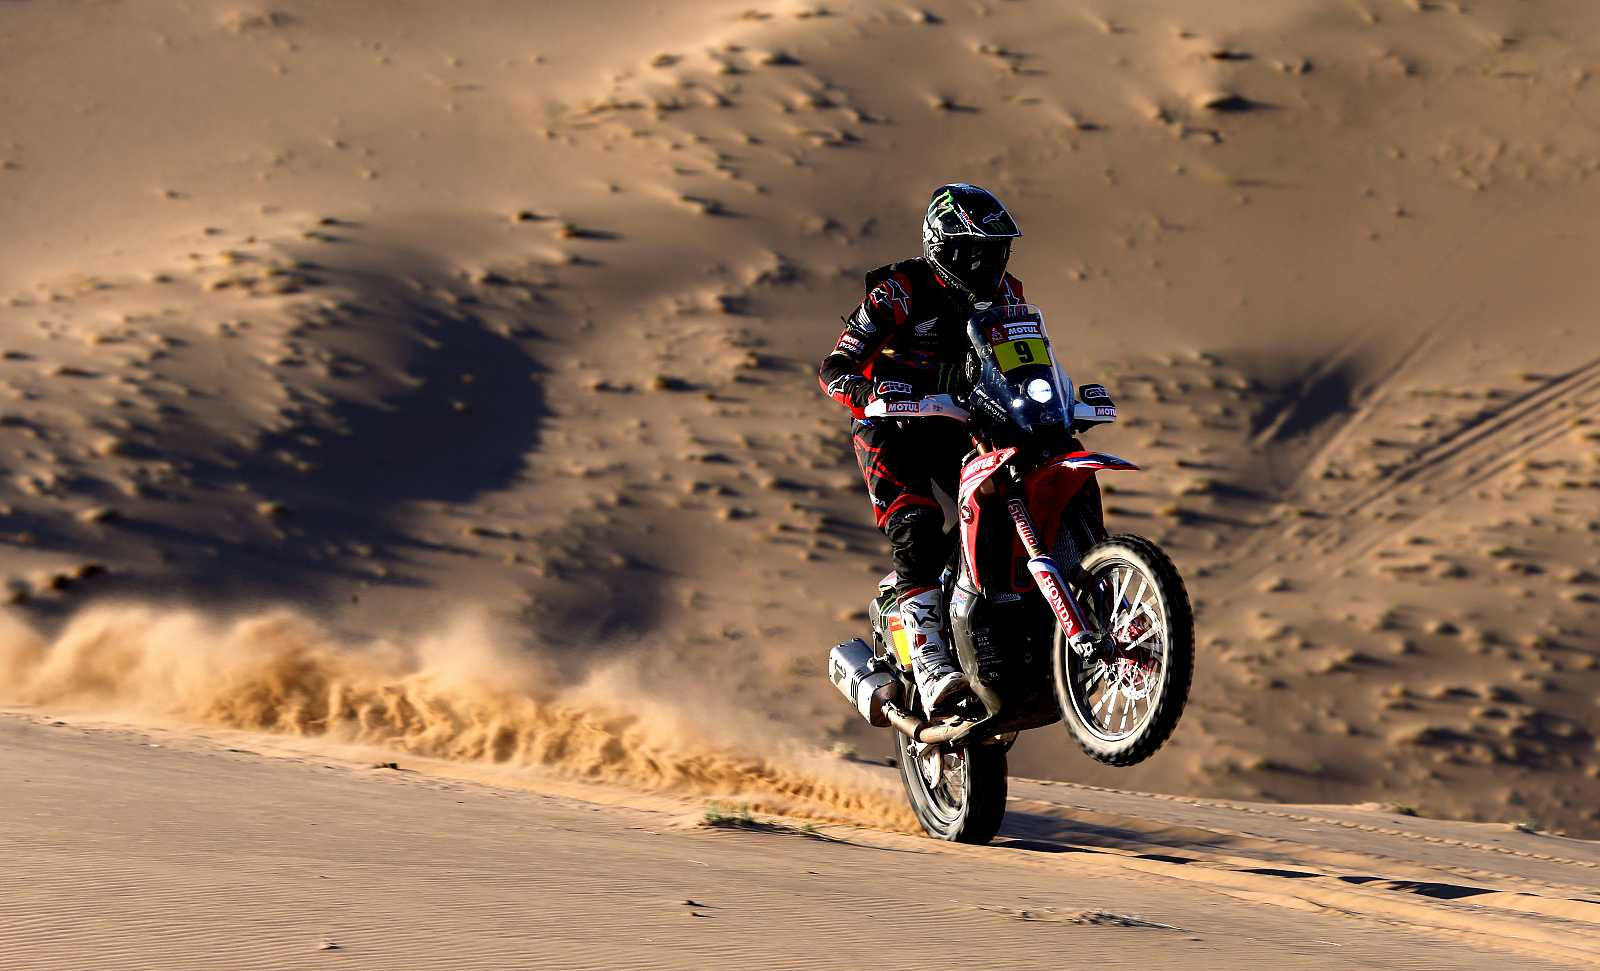 Imagen del estadounidense Ricky Brabec durante la primera etapa del rally Dakar 2020.